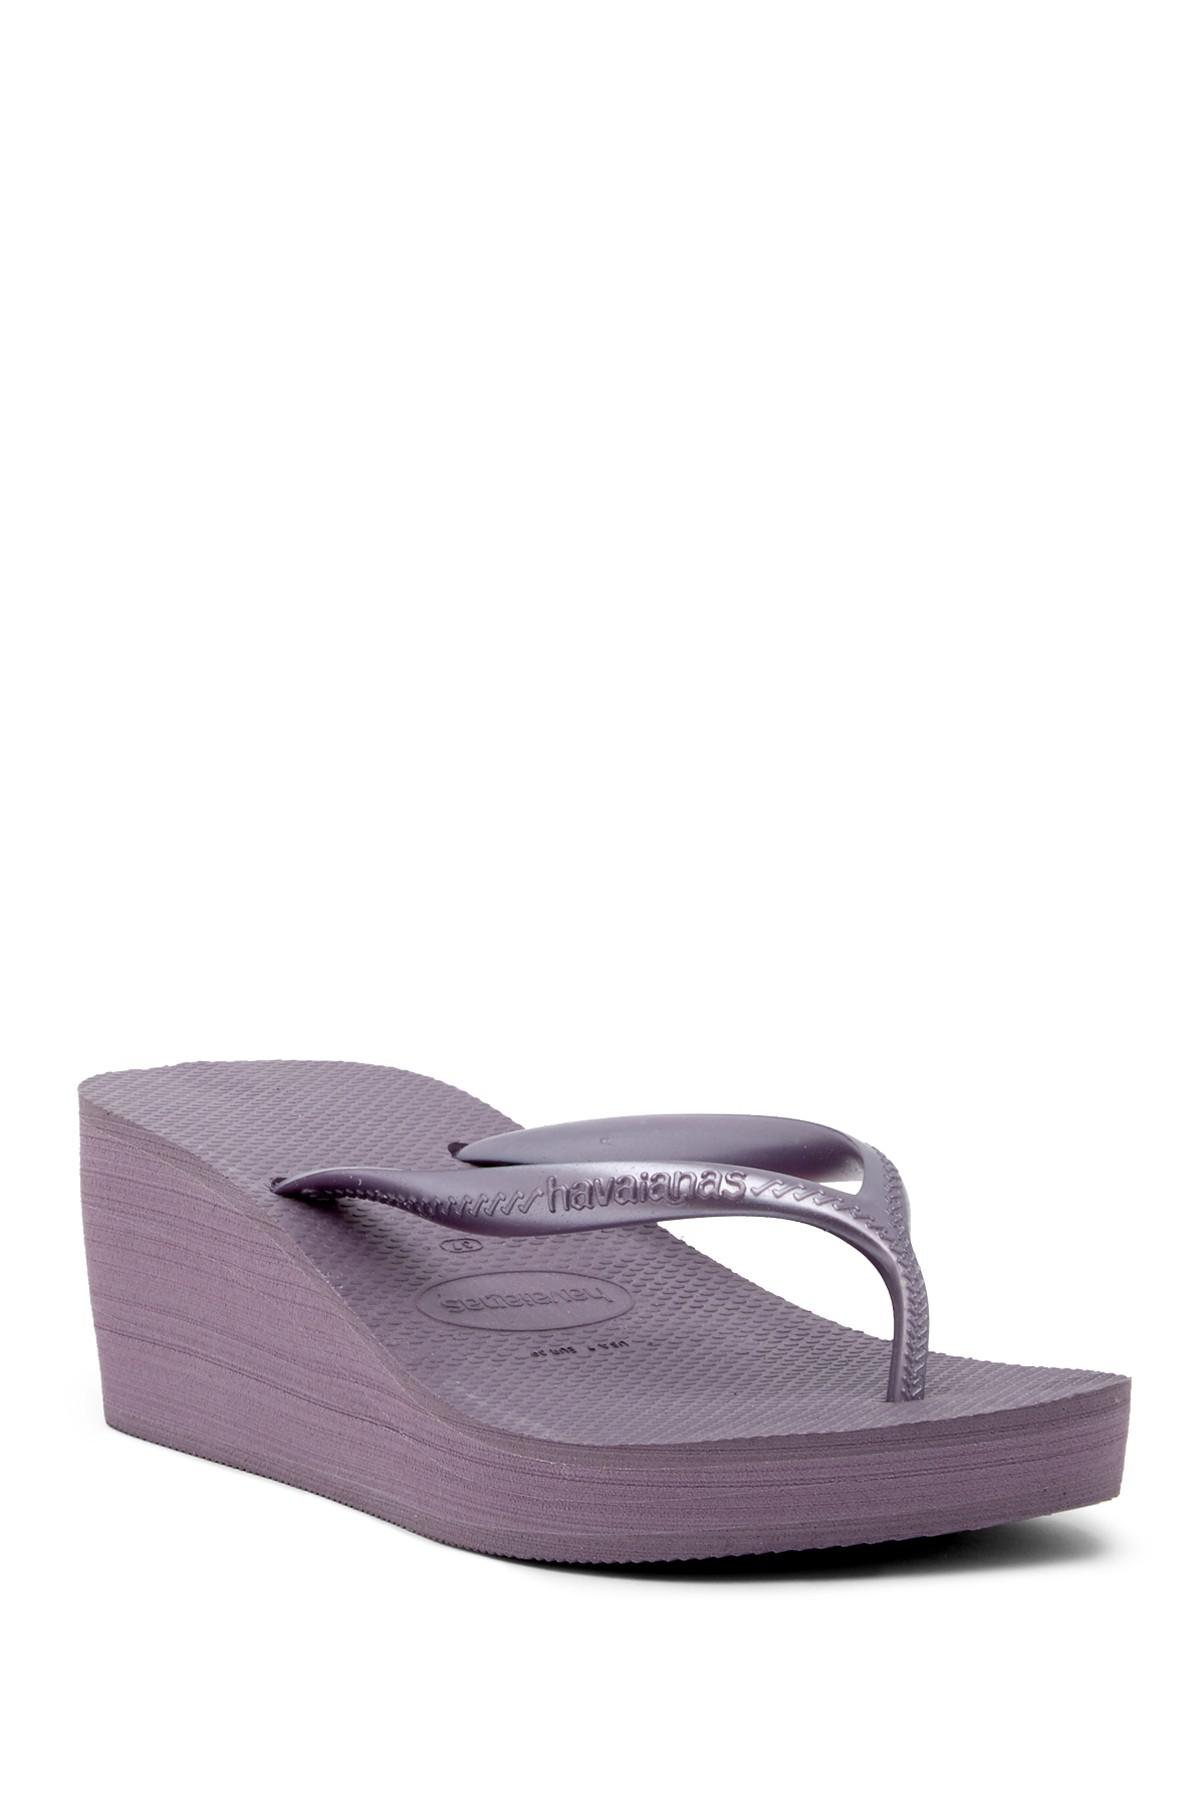 3a1b2a34925 Lyst - Havaianas High Fashion Platform Wedge Flip Flop Sandal (women ...